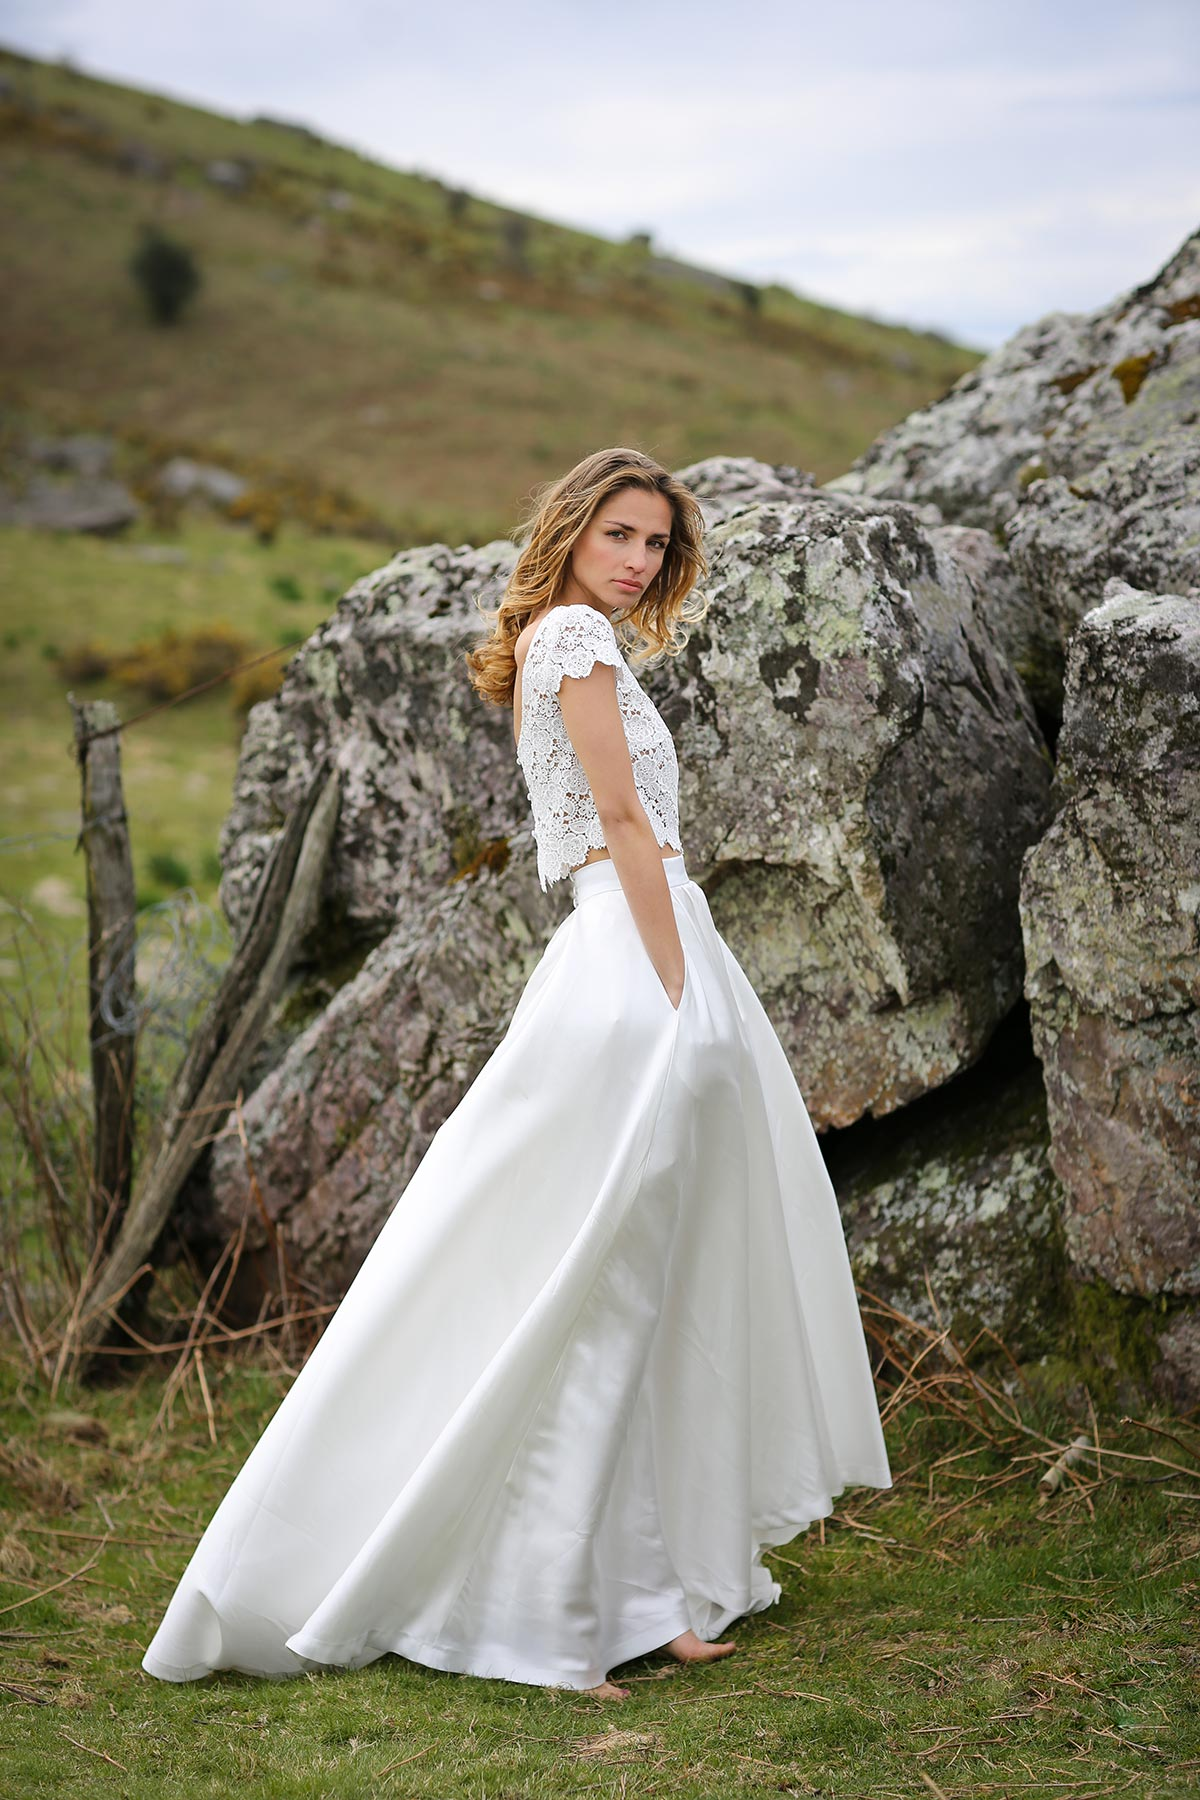 ciboure-top-cali-jupe-2N2A4169-marie-laporte-creatrice-robe-mariee-2017